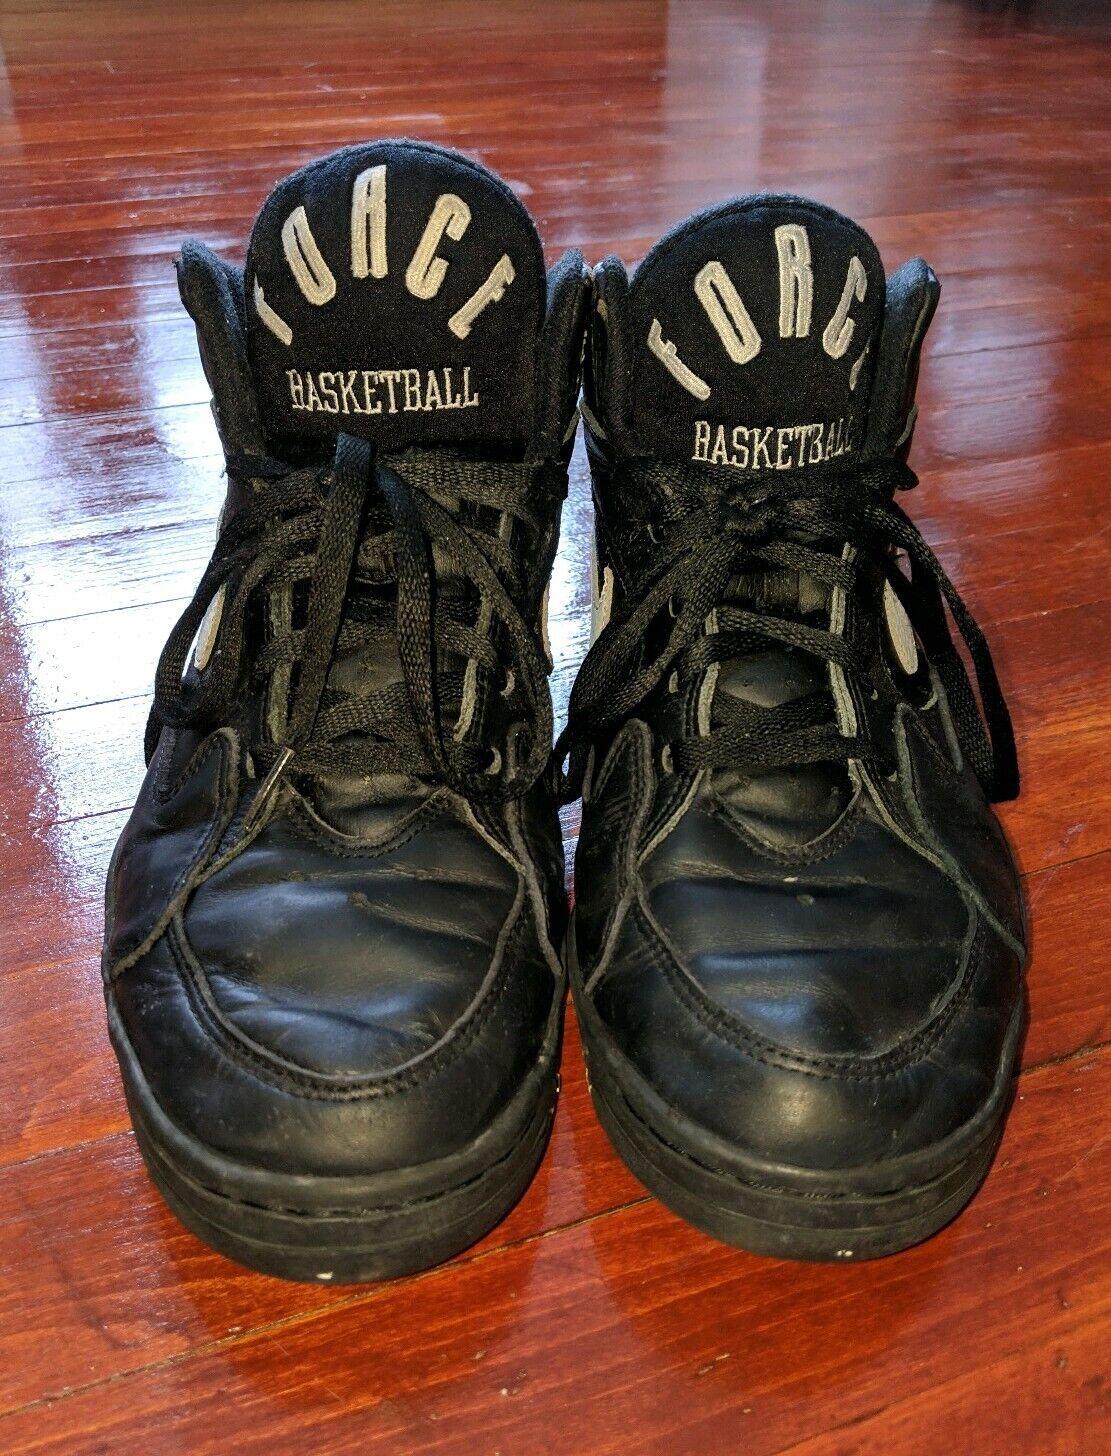 Nike Force Basketball 1992 Vintage Nike Forces Size 10.5 NO BOX VTG Nikes